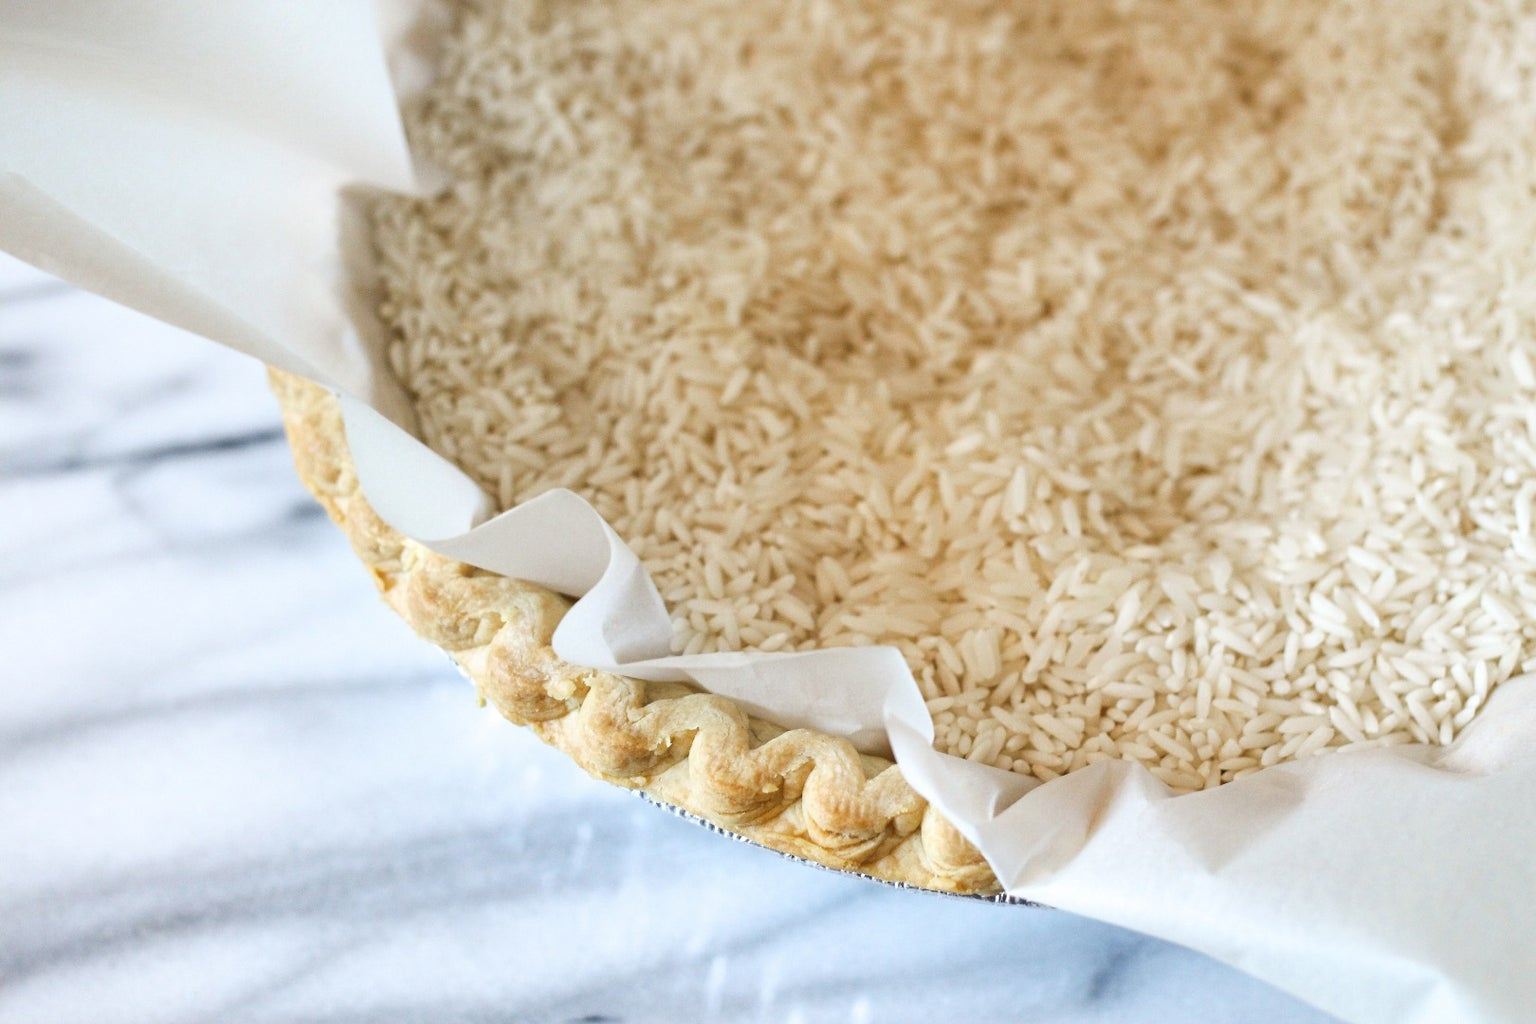 Blind Bake the Pie Crust